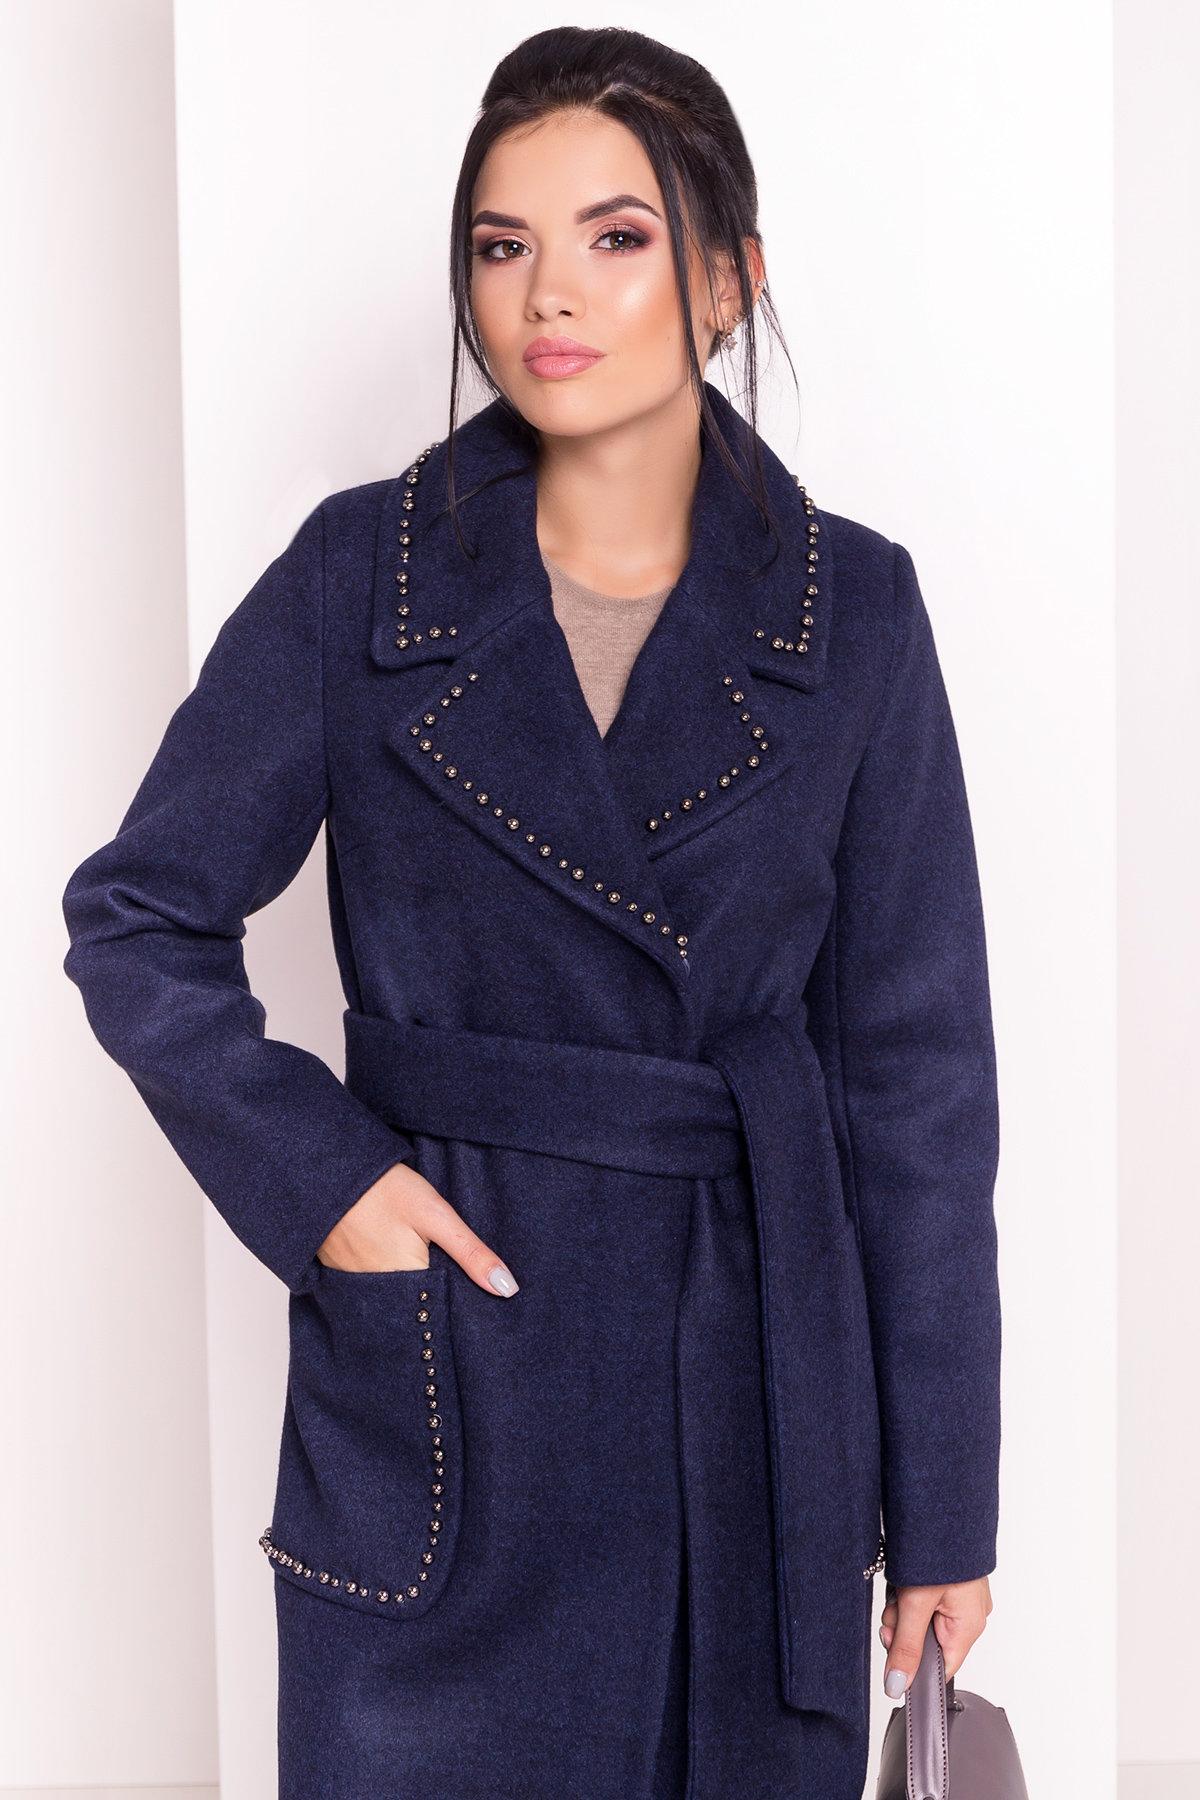 Пальто Кейси 5504 АРТ. 37032 Цвет: Темно-синий 17 - фото 3, интернет магазин tm-modus.ru